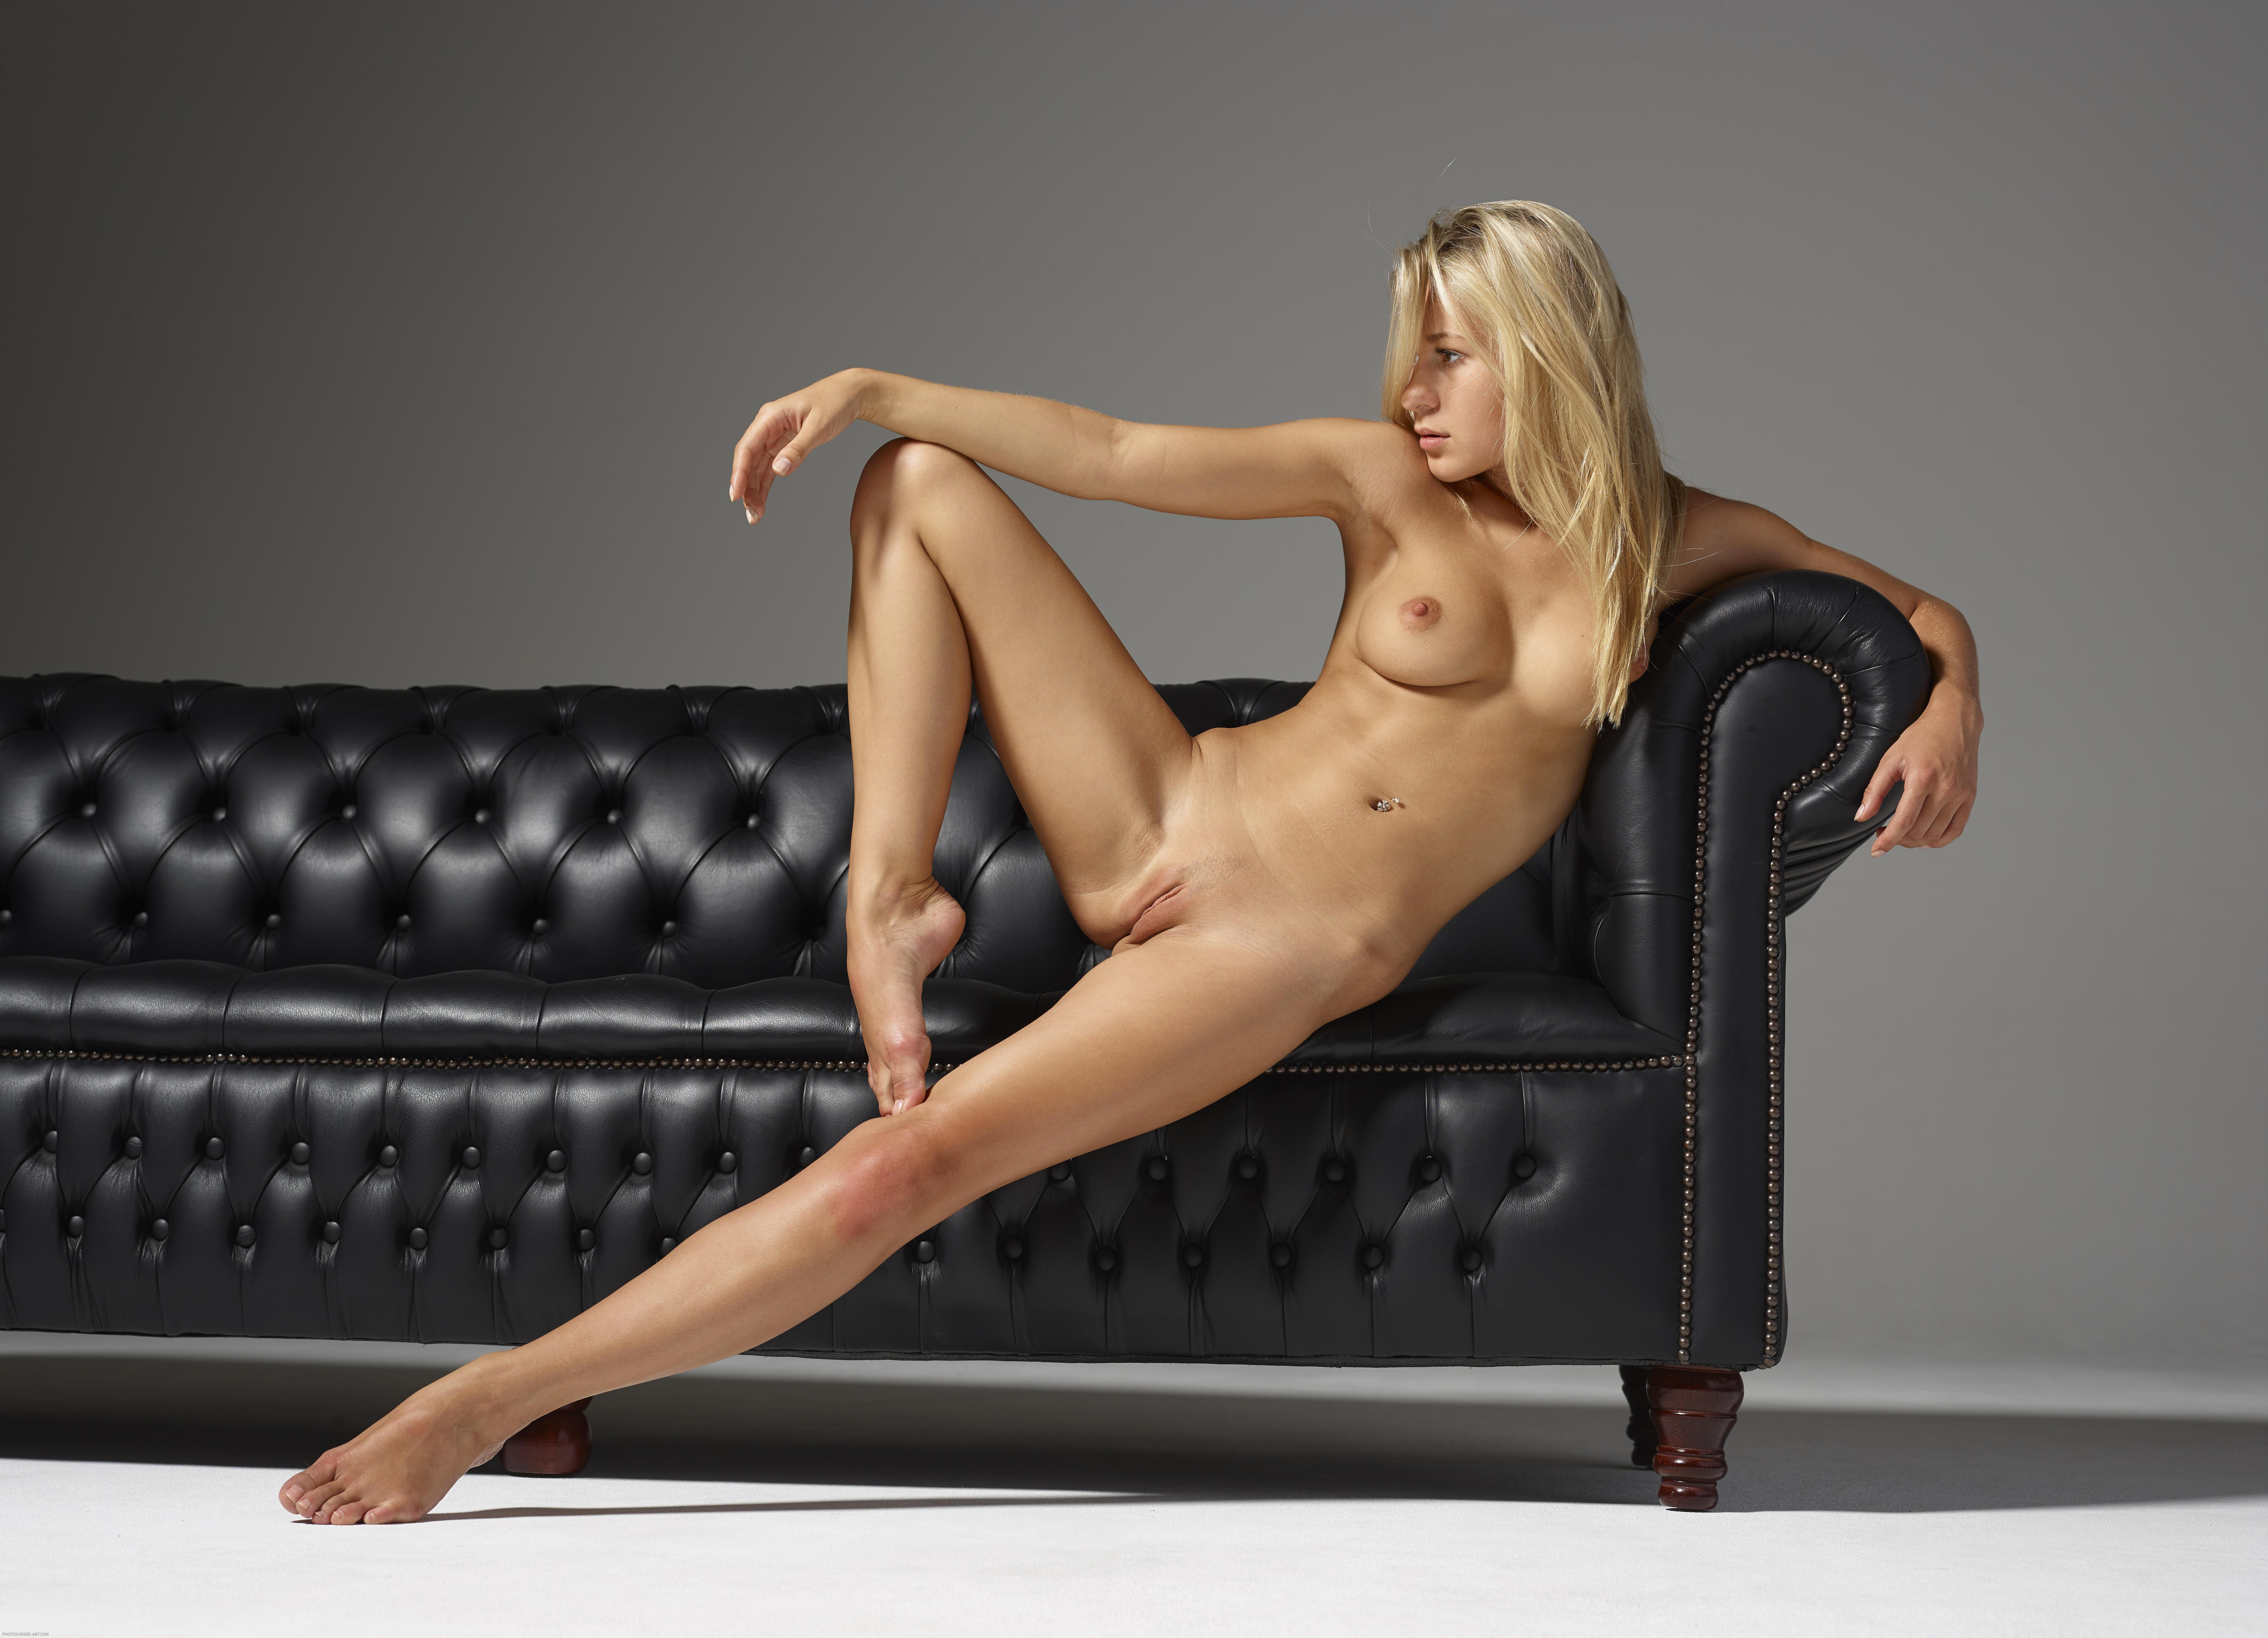 Girls of tahiti naked